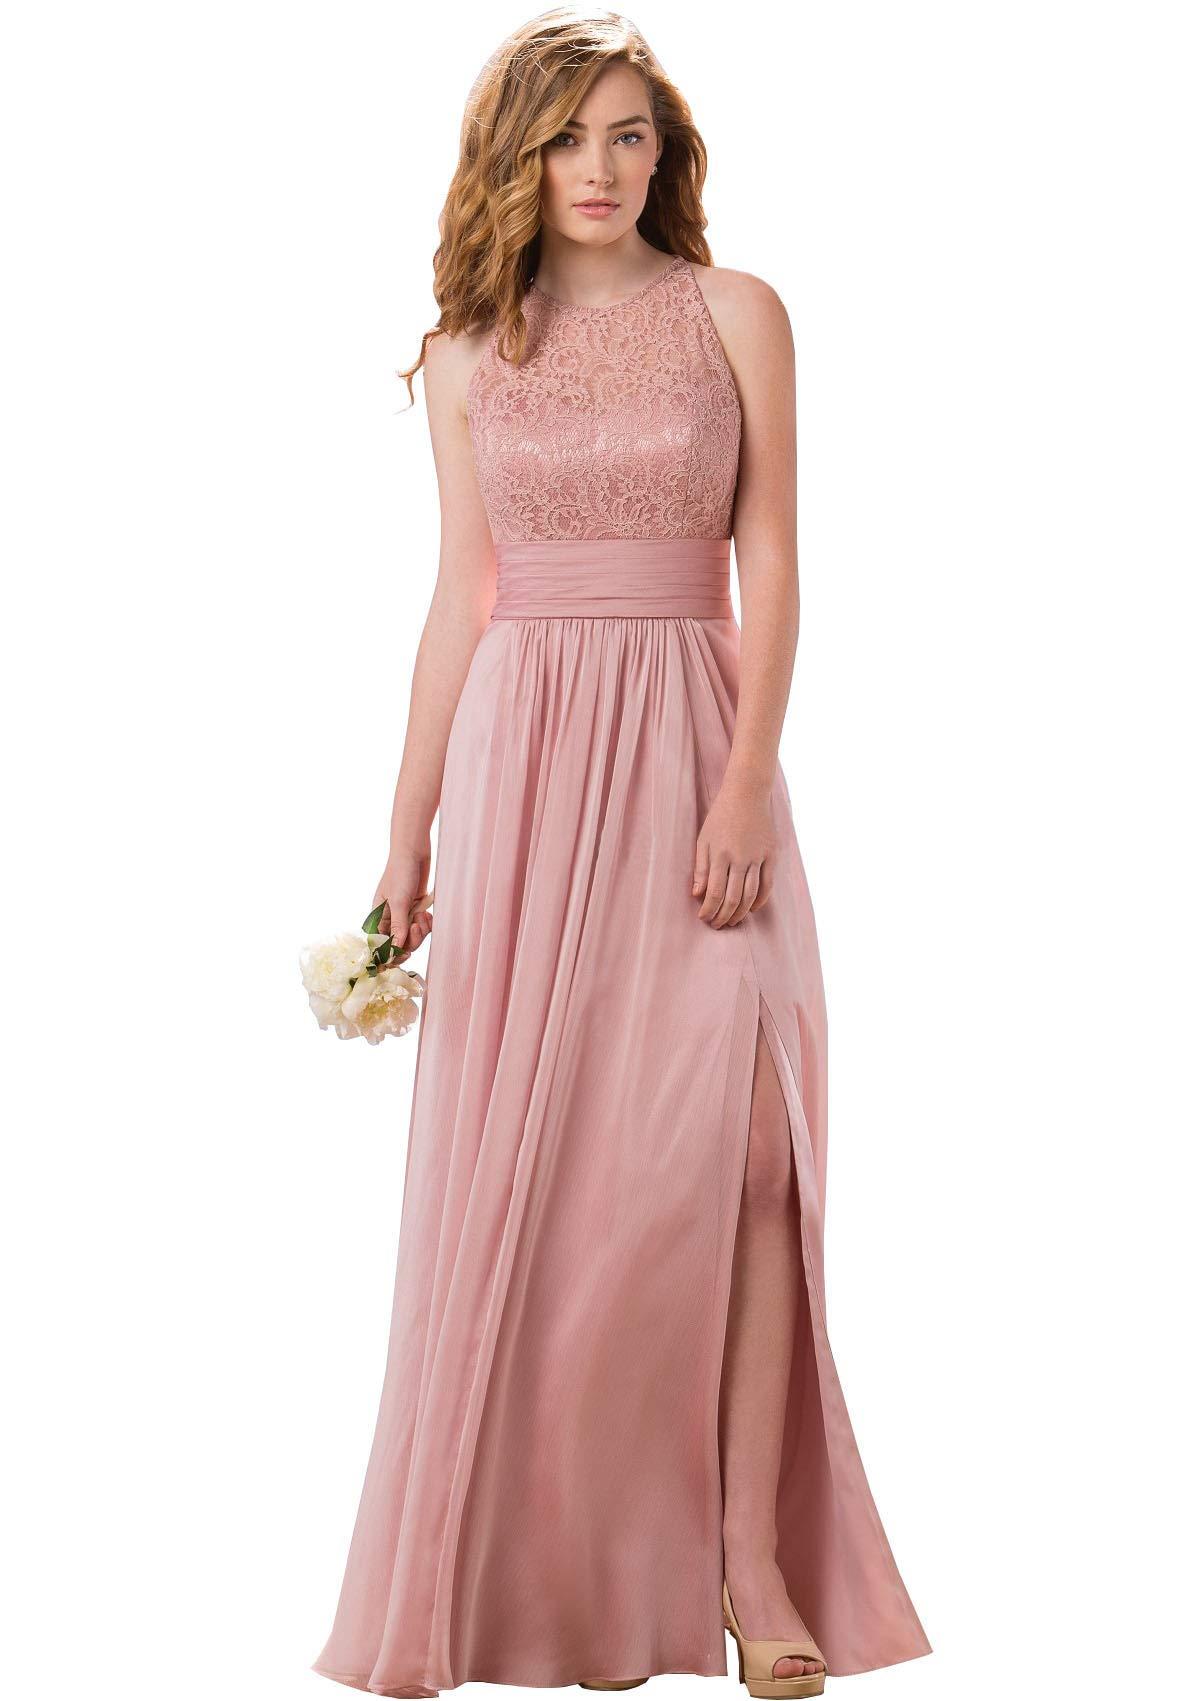 Women S Halter Slit Lace Chiffon Bridesmaid Dress Long Backless Wedding Guest Dress Dusty Rose Us2